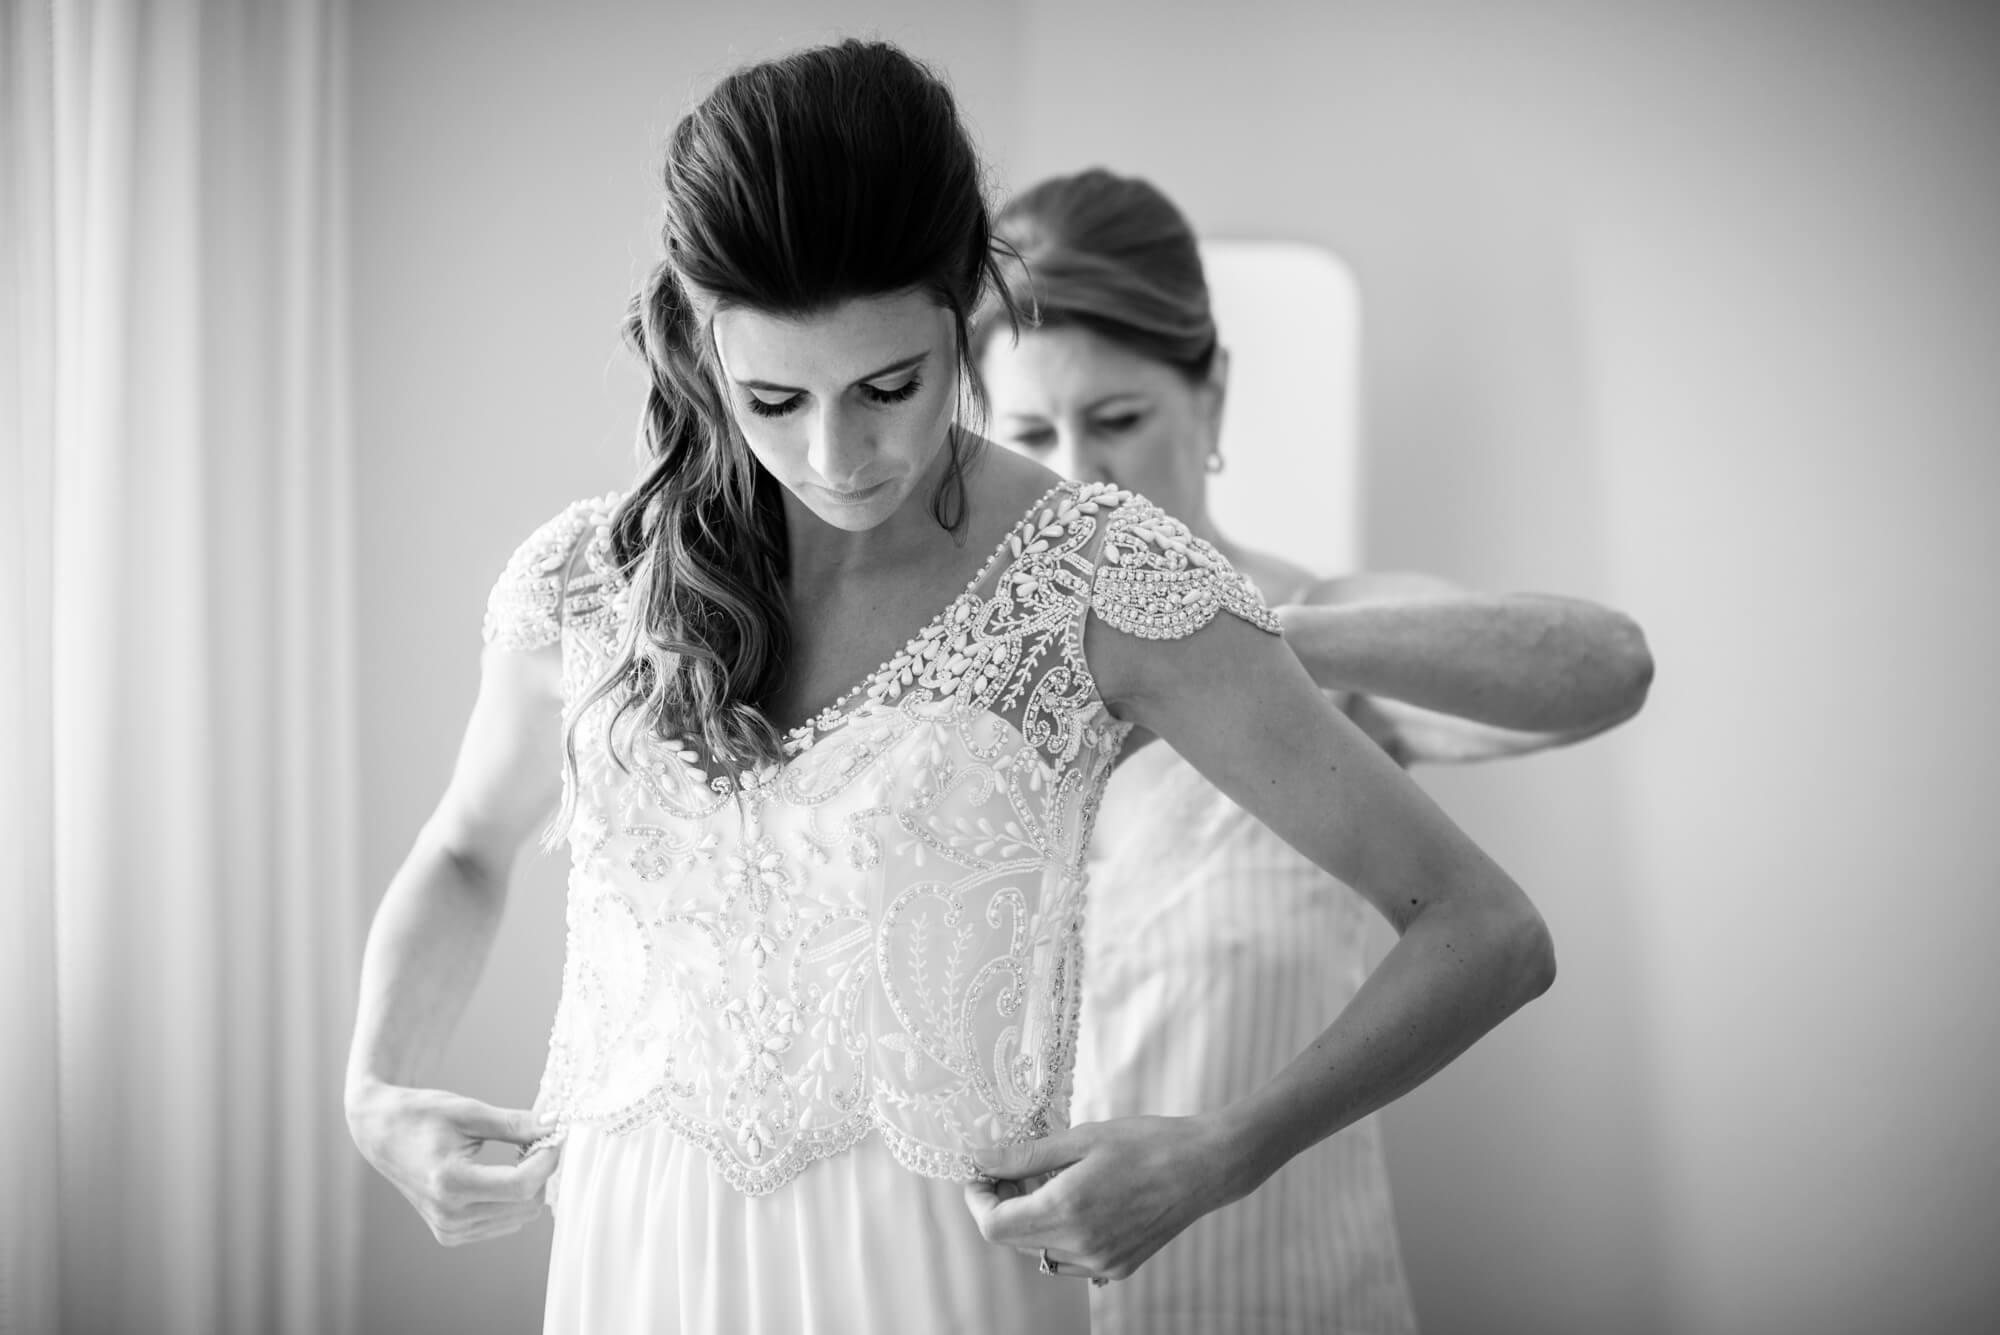 bride getting ready silk wedding dress veil mother of bride